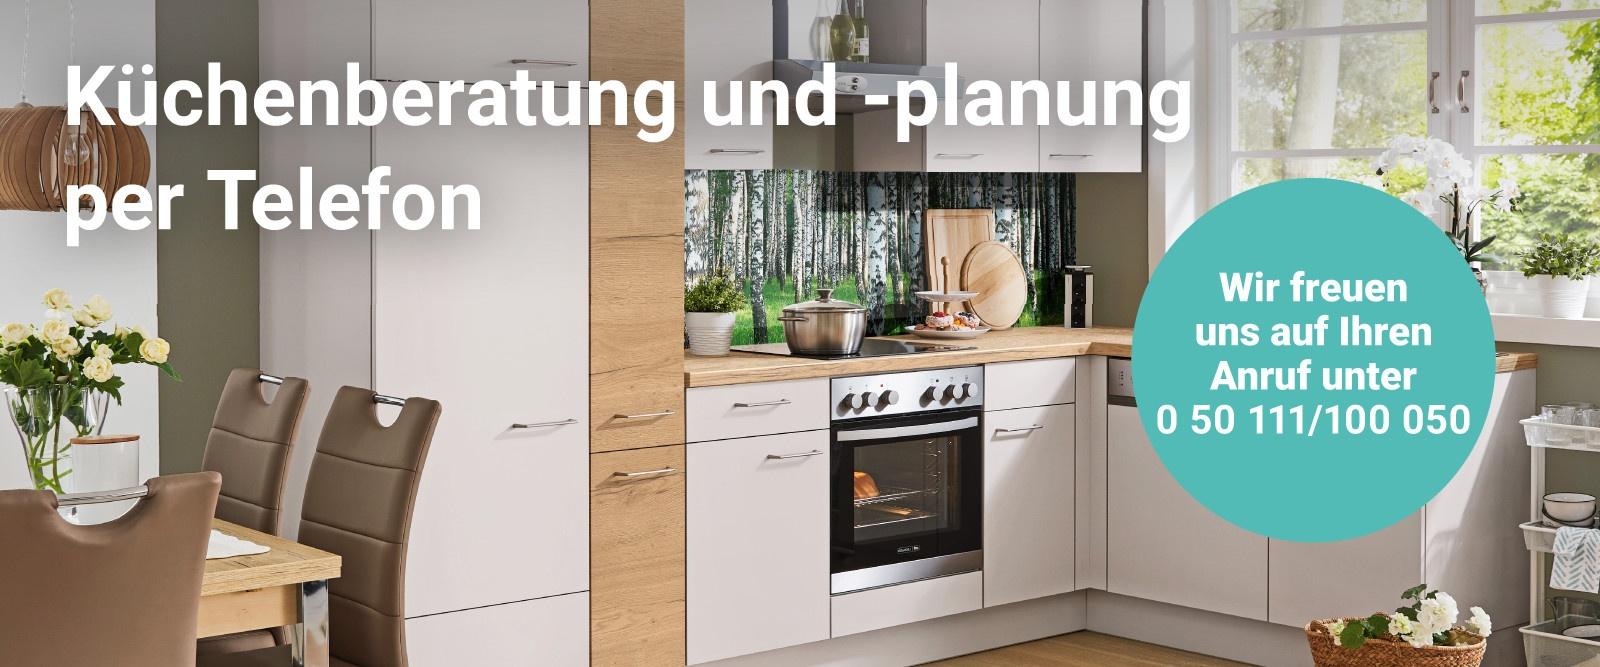 ntm_covid_kuechenplanung_mobile